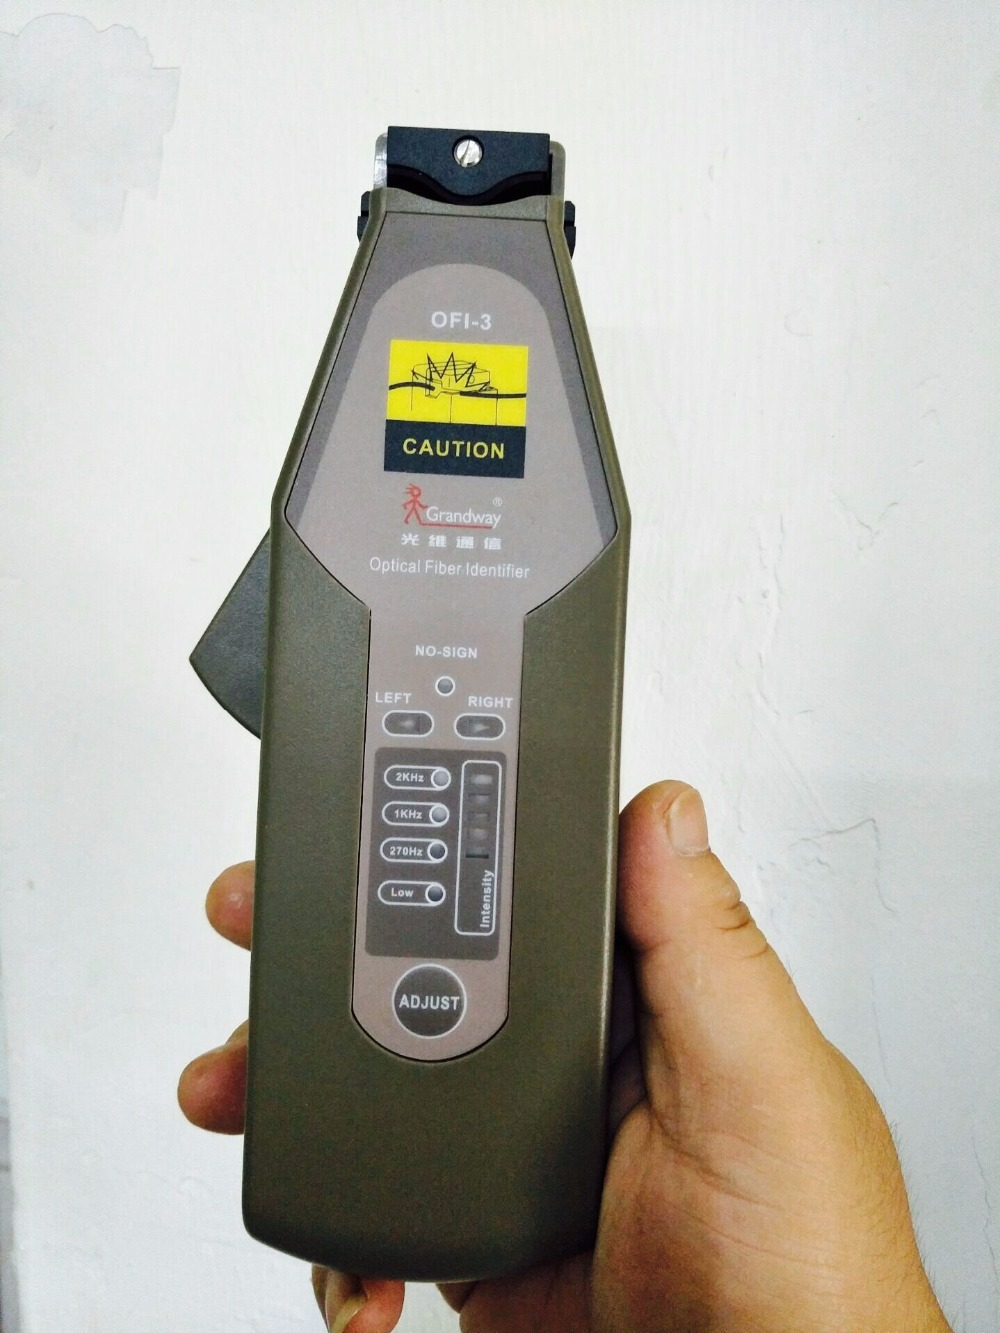 OFI 3 Grandway High Performance Optical Fiber Identifier Live Fiber Optical Identifier 900 1650nm